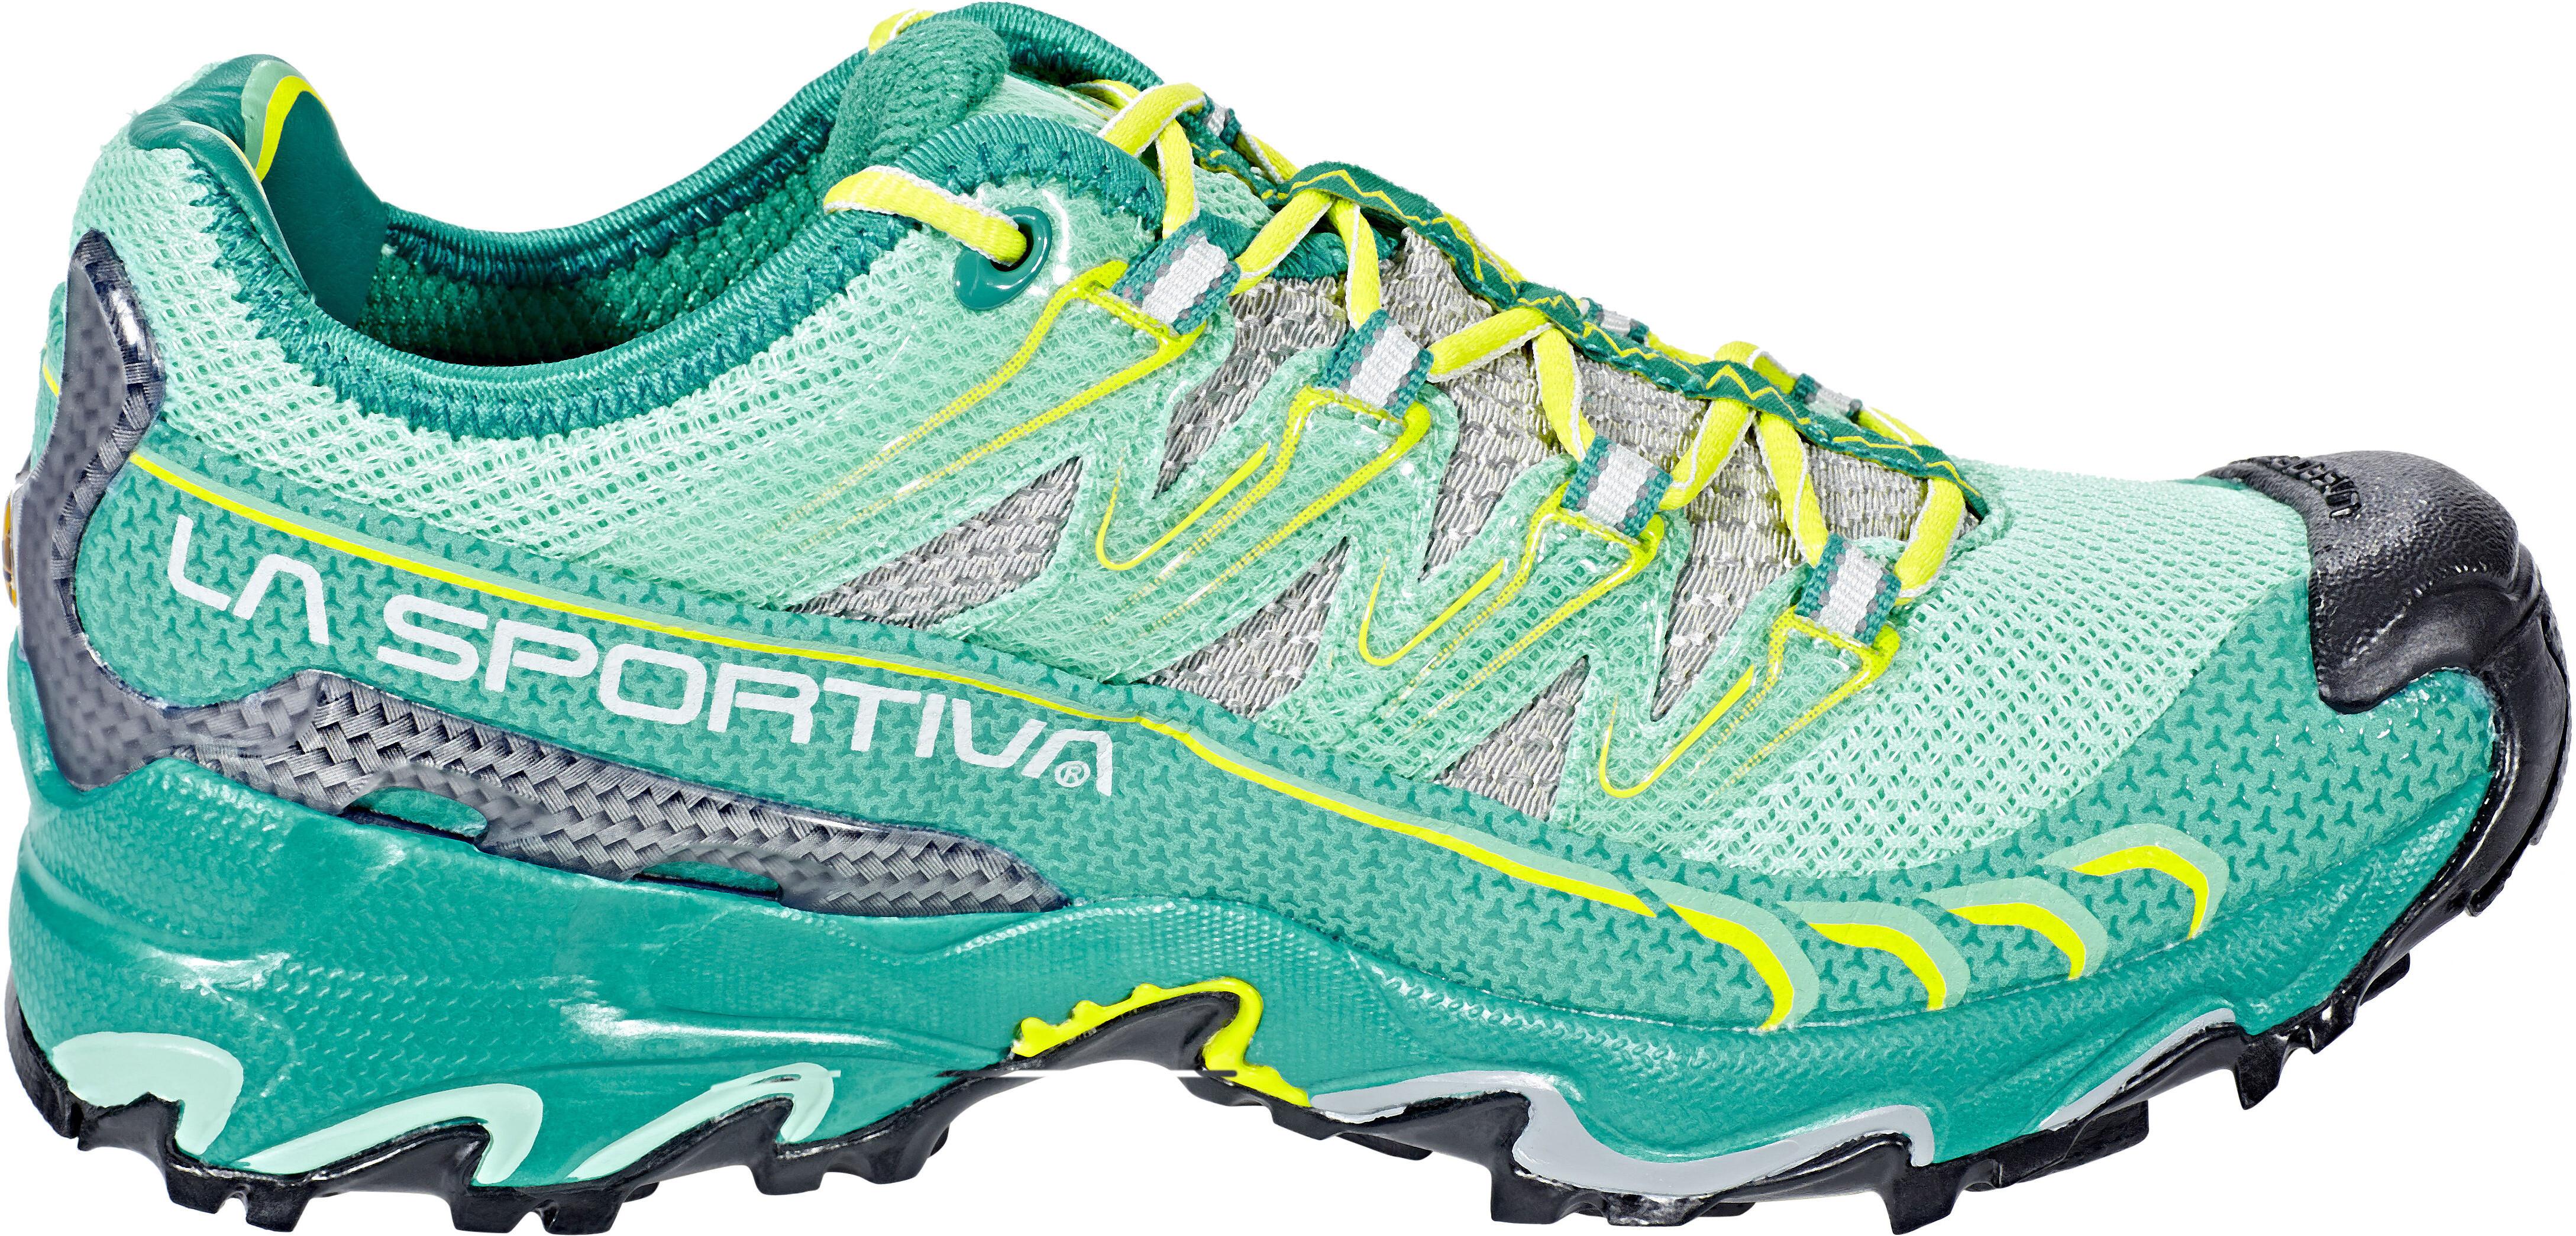 05aa81013f2 La Sportiva Ultra Raptor Running Shoes Women turquoise at Addnature ...